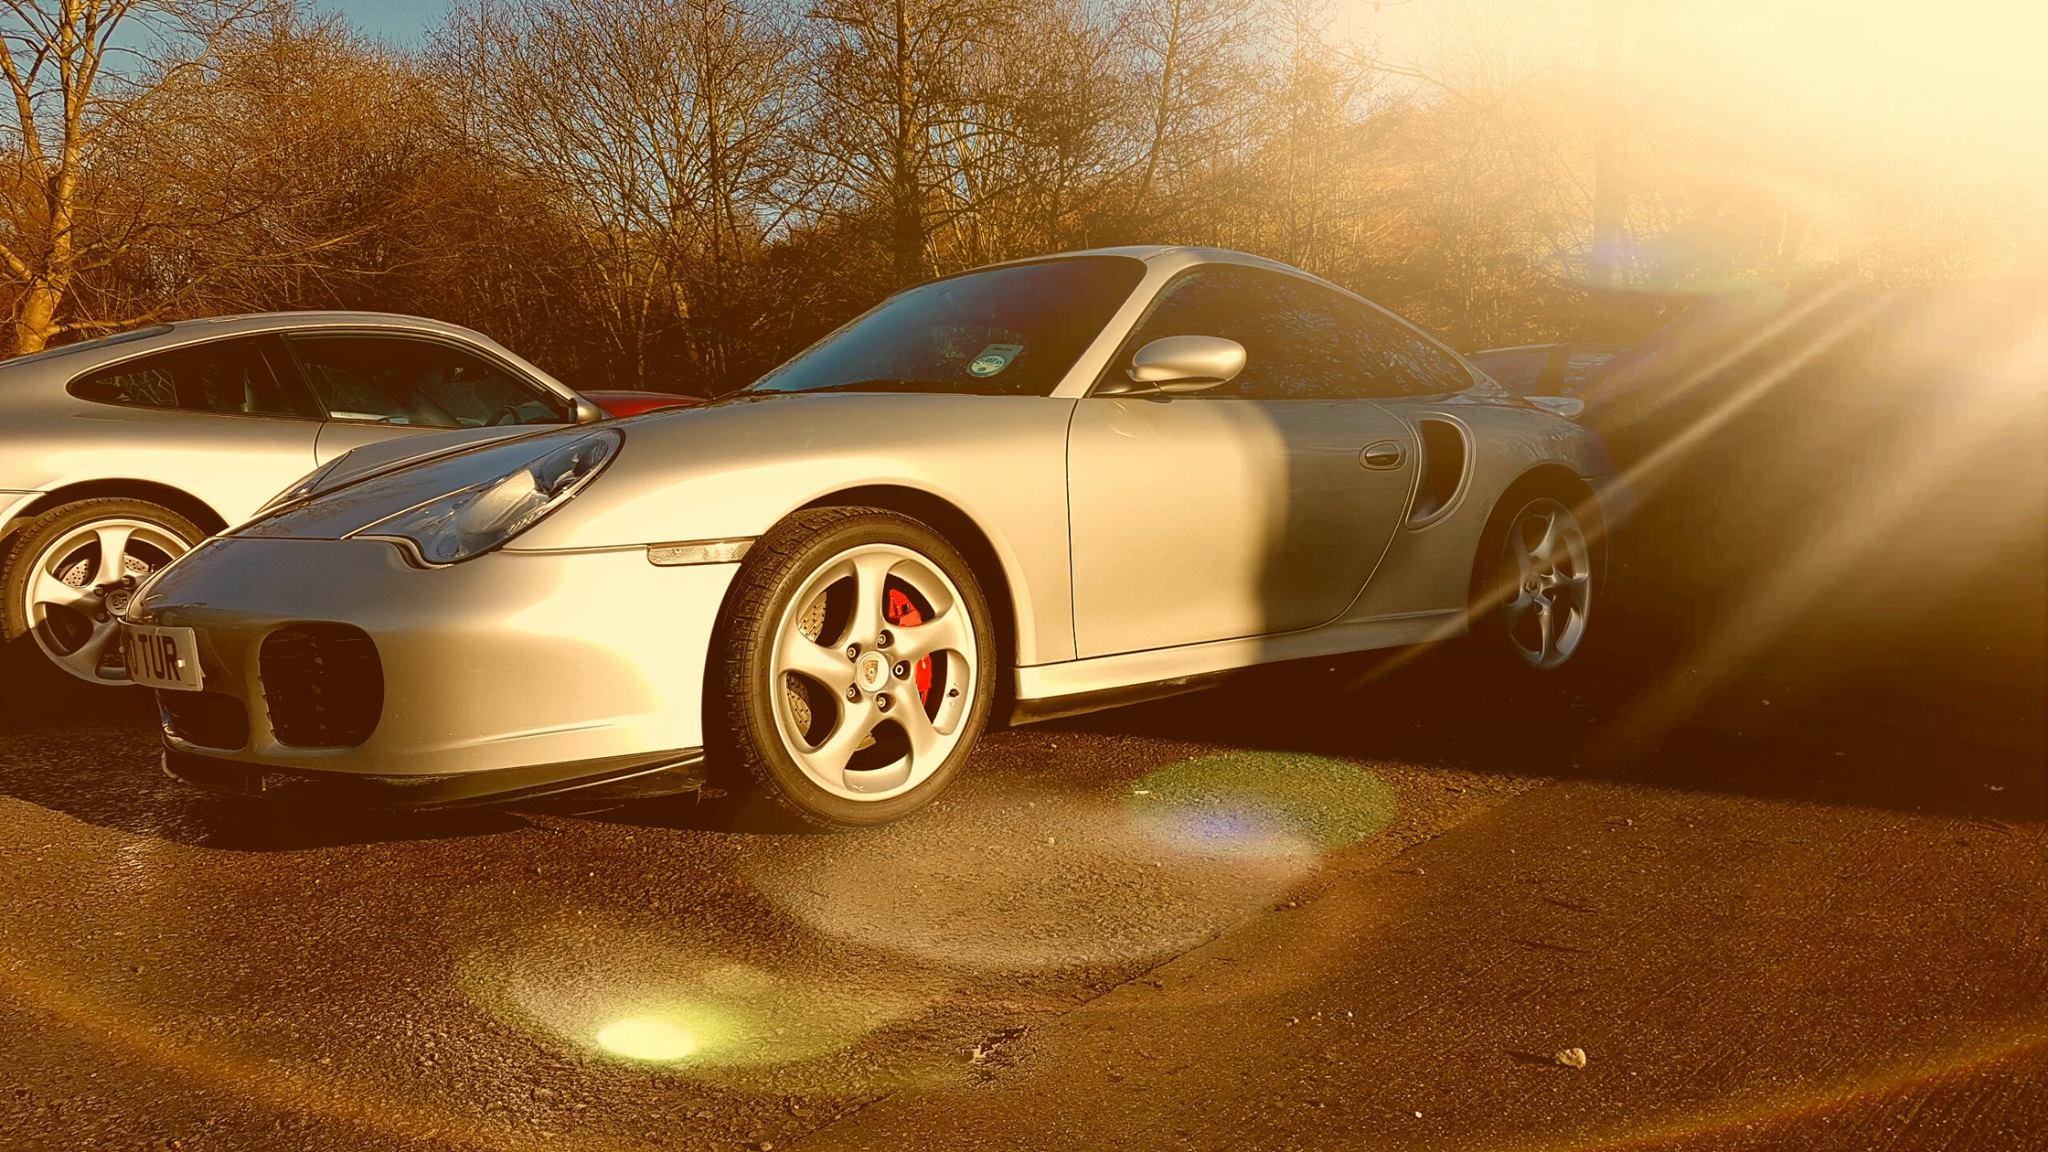 Ians Ultra-low Mileage 996 Turbo